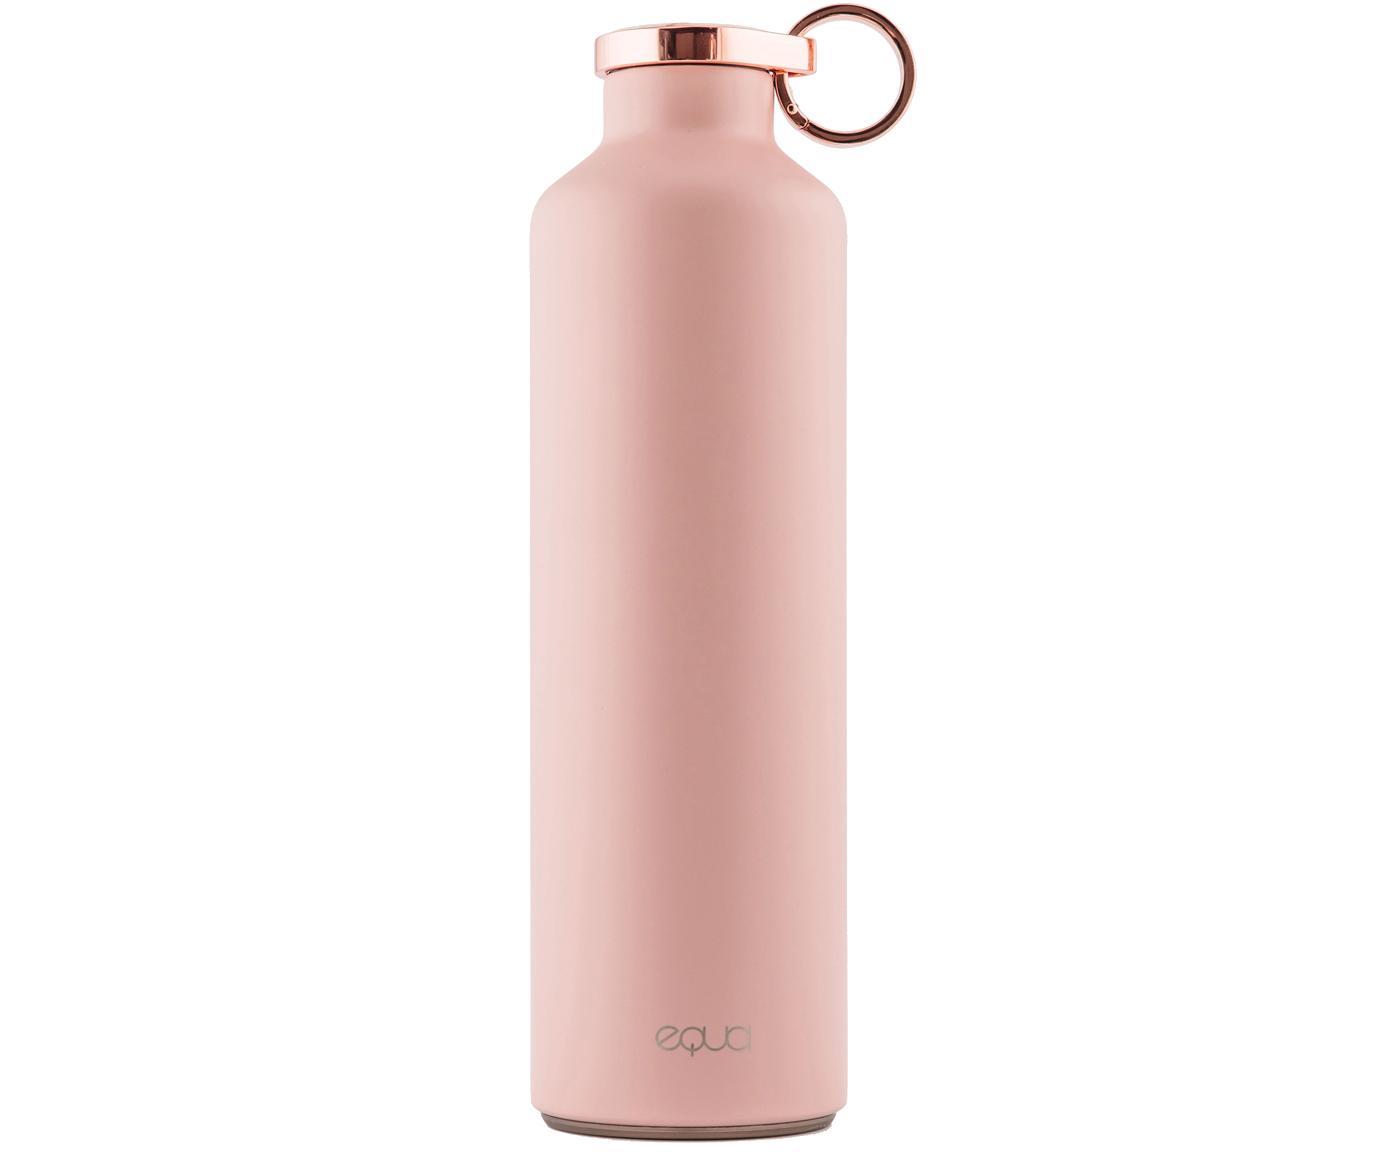 Thermosfles Basic, Gecoat edelstaal, Roze, koperkleurig, Ø 8 x H 26 cm